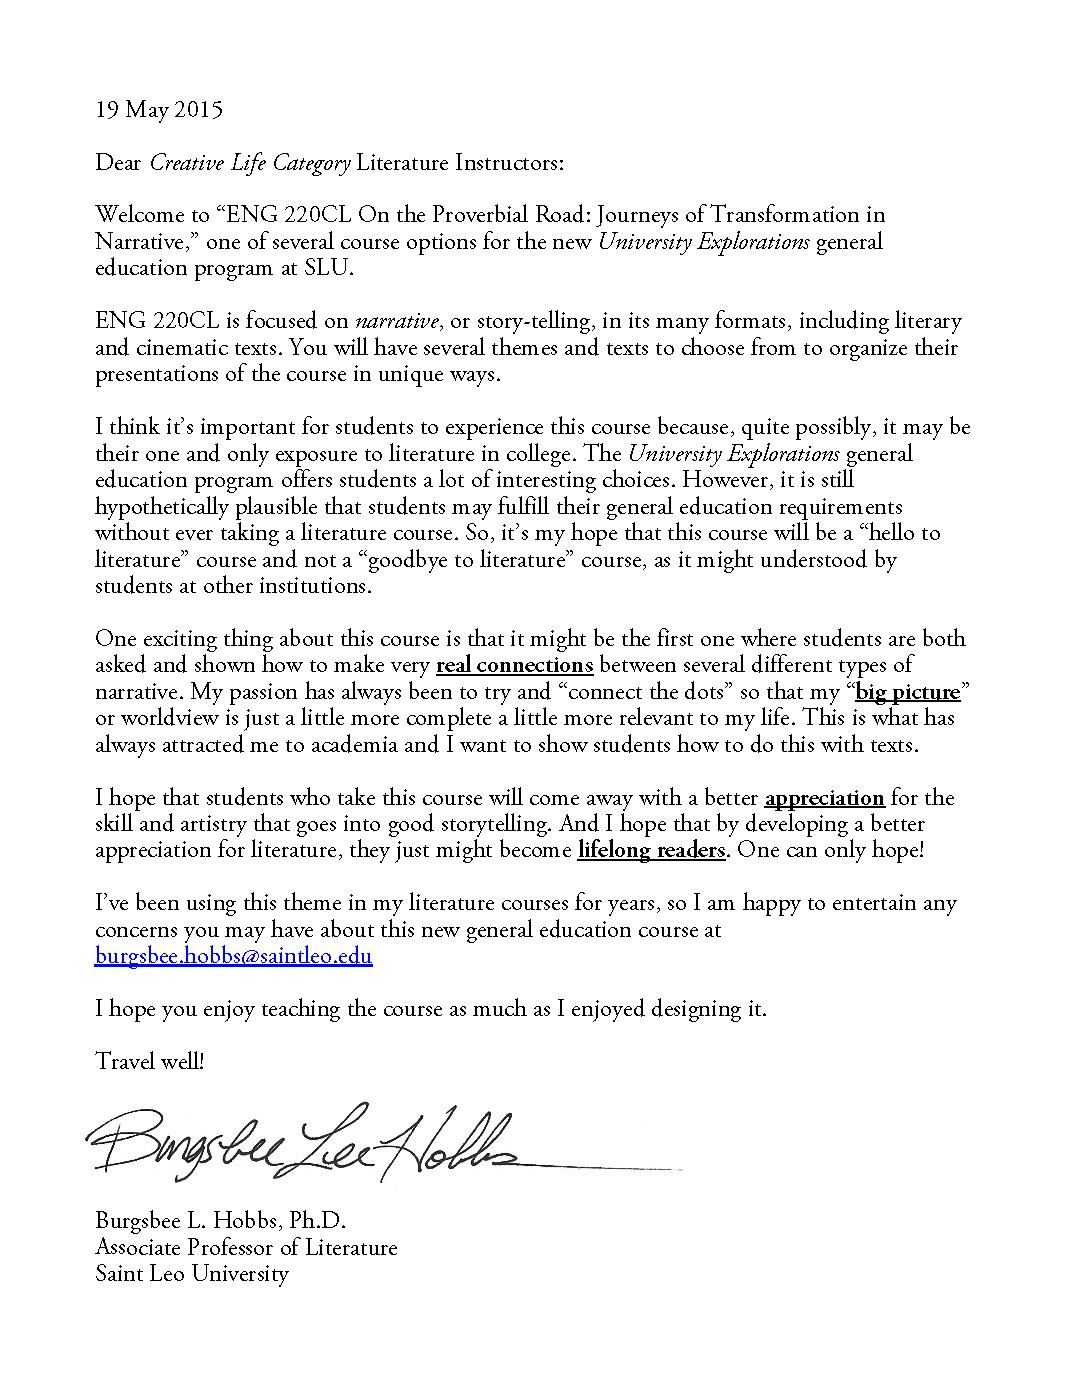 Dr. Hobbs's Letter to ENG 220CL Instructors